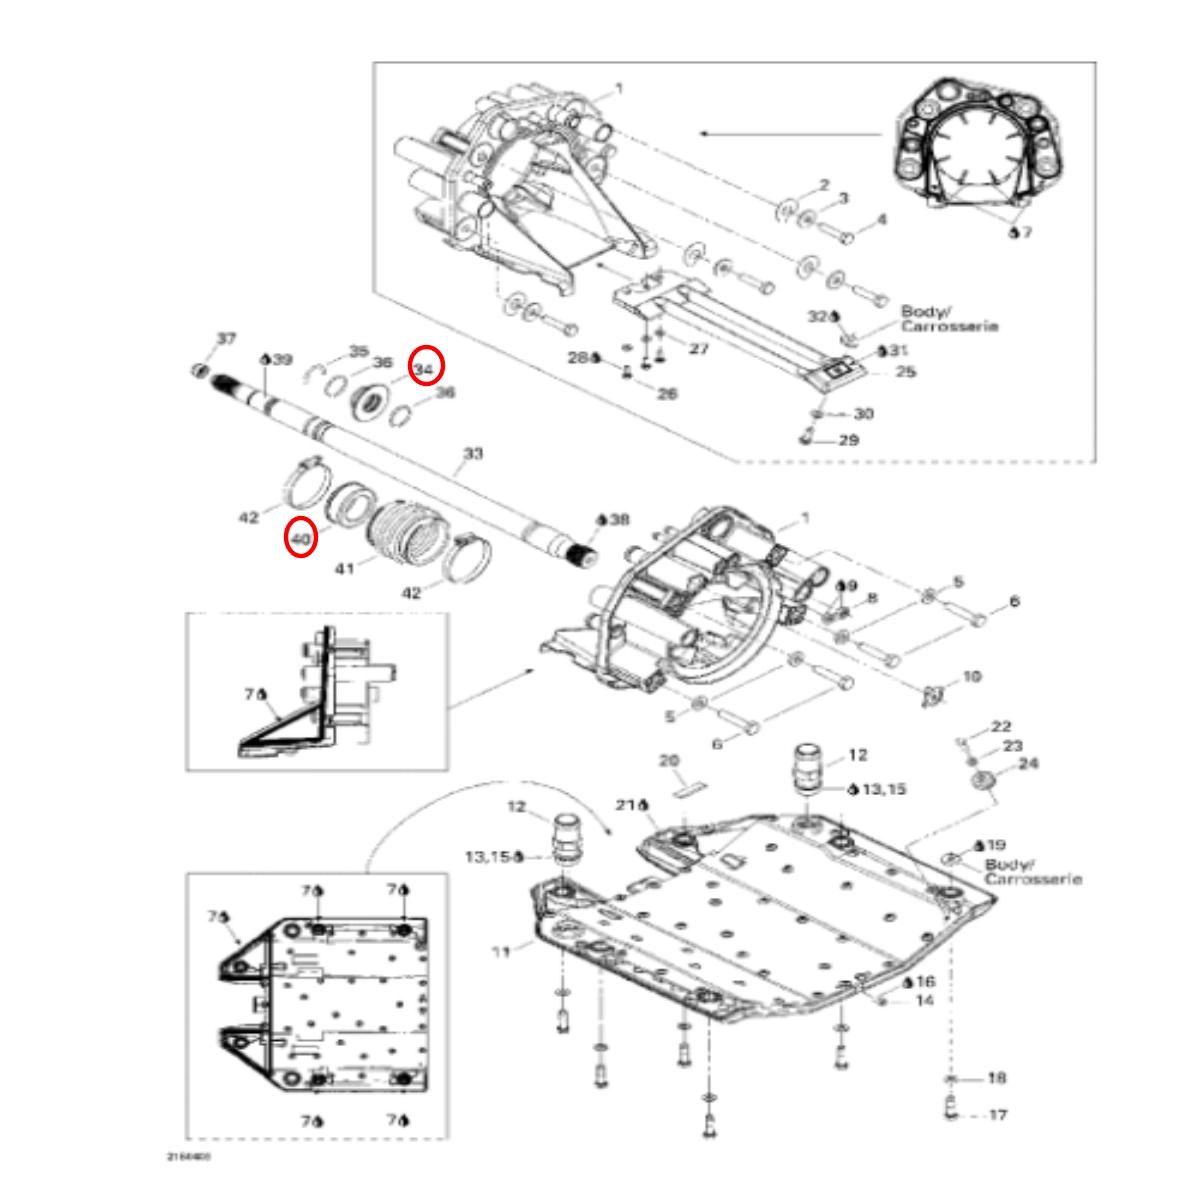 Anel de Carbono Kit  e Bucha Inox Sea Doo RXT/RXP/GTX 215/255/260  - Radical Peças - Peças para Jet Ski